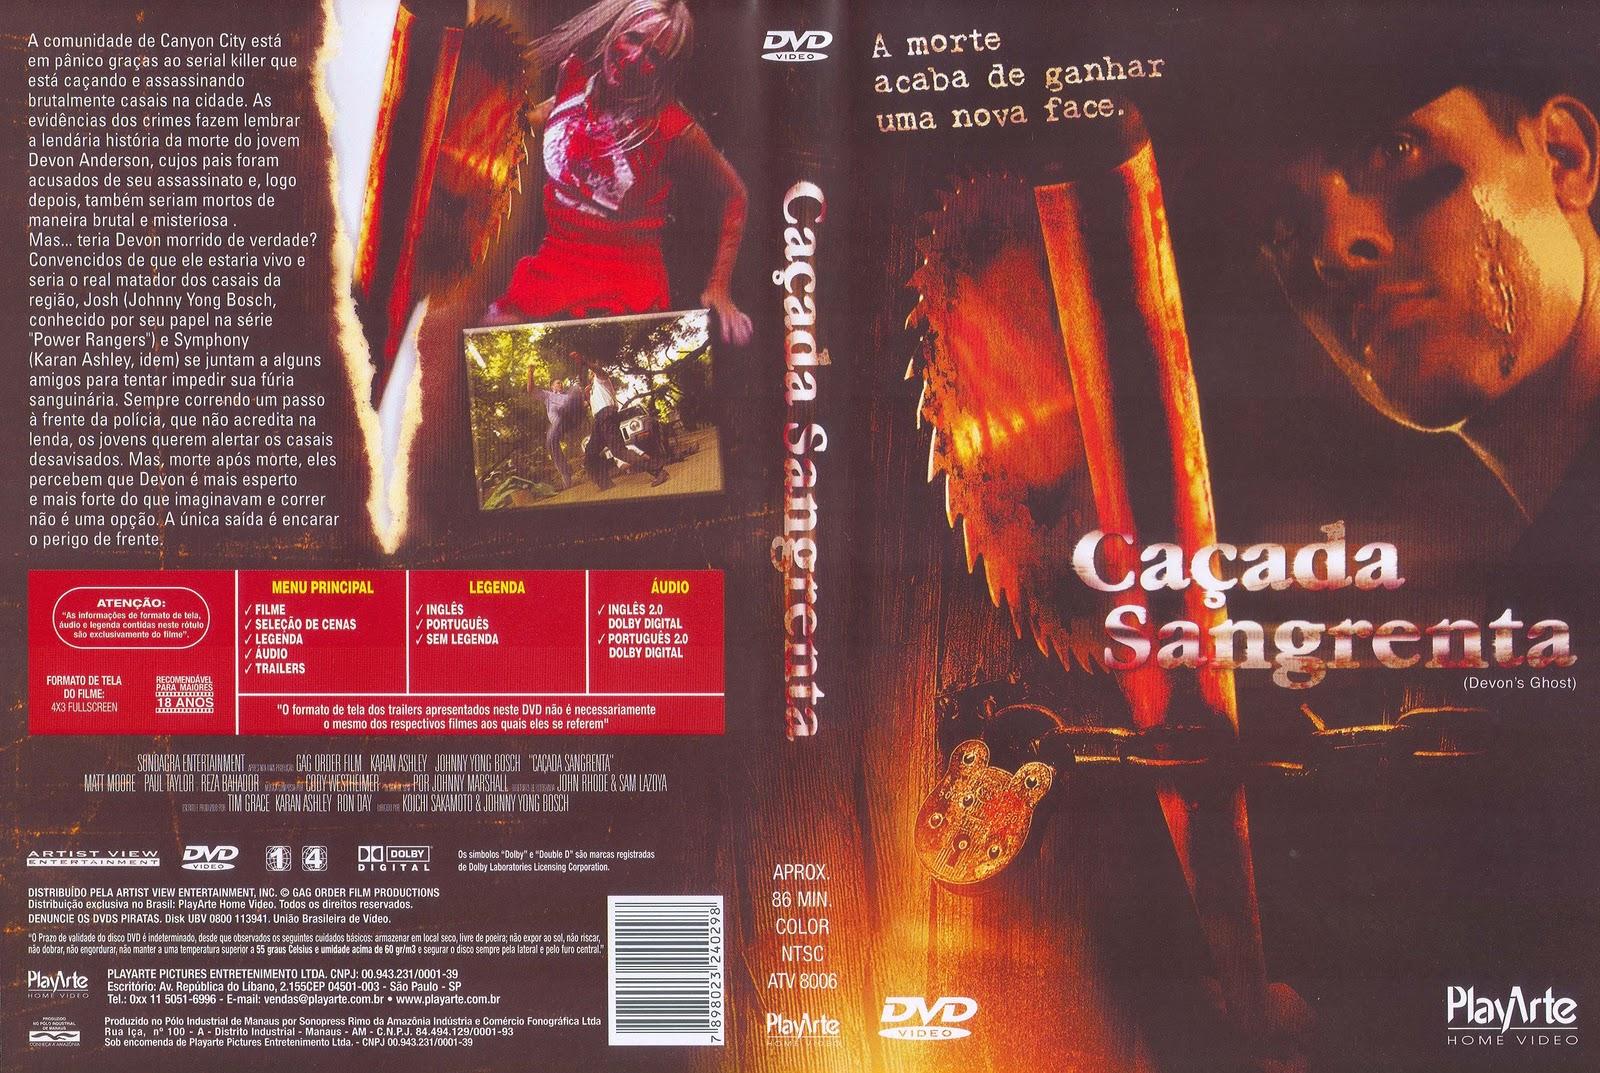 Caçada Sangrenta DVD Capa